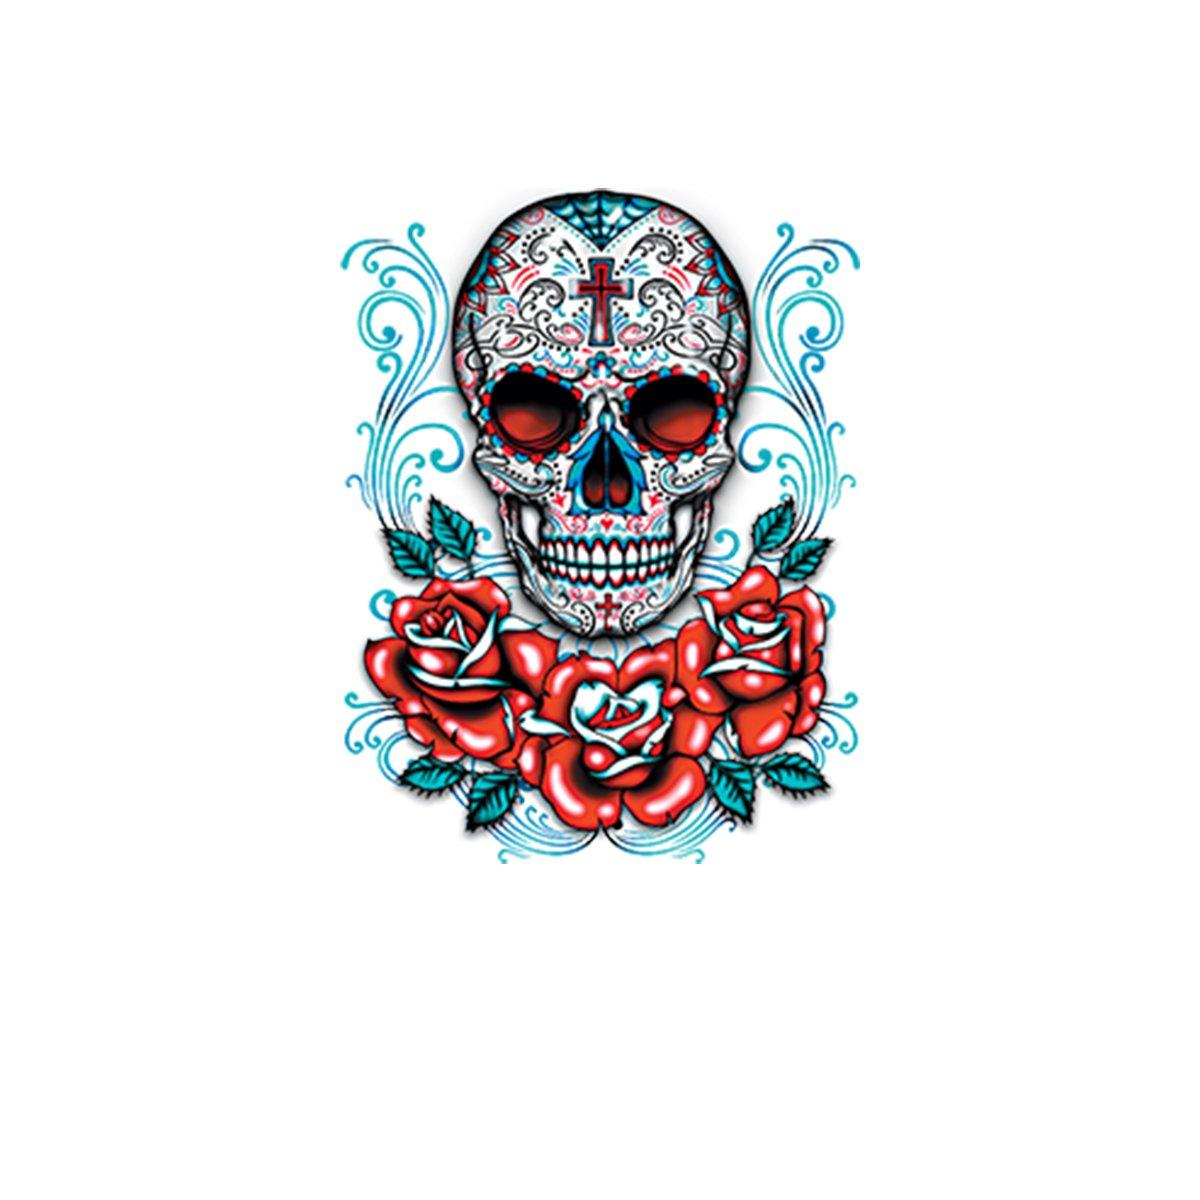 Skull Roses Cross Womens T-shirt XS-3XL